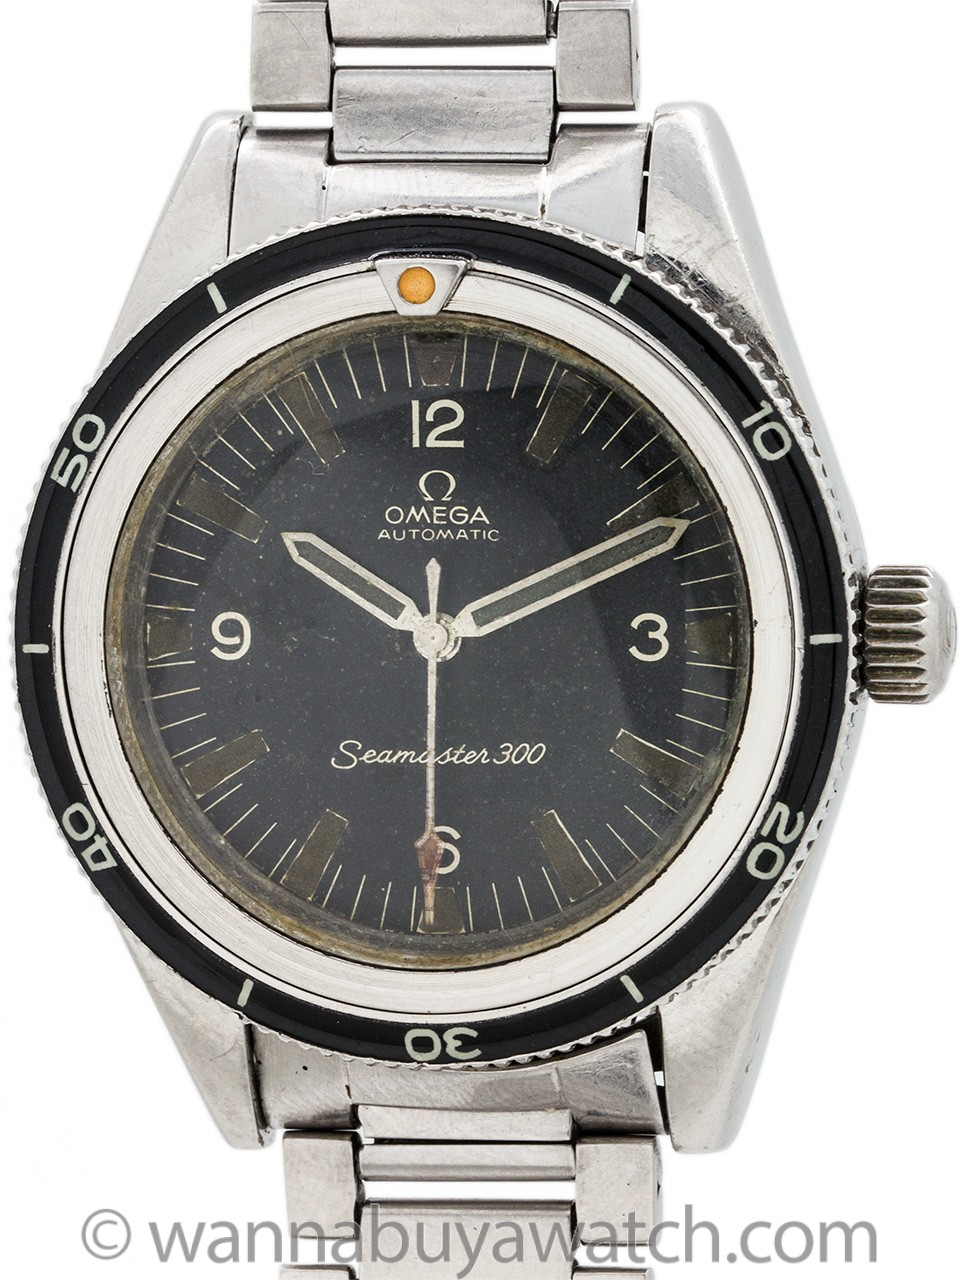 Omega Seamaster 300 ref 165.104-64 circa 1965